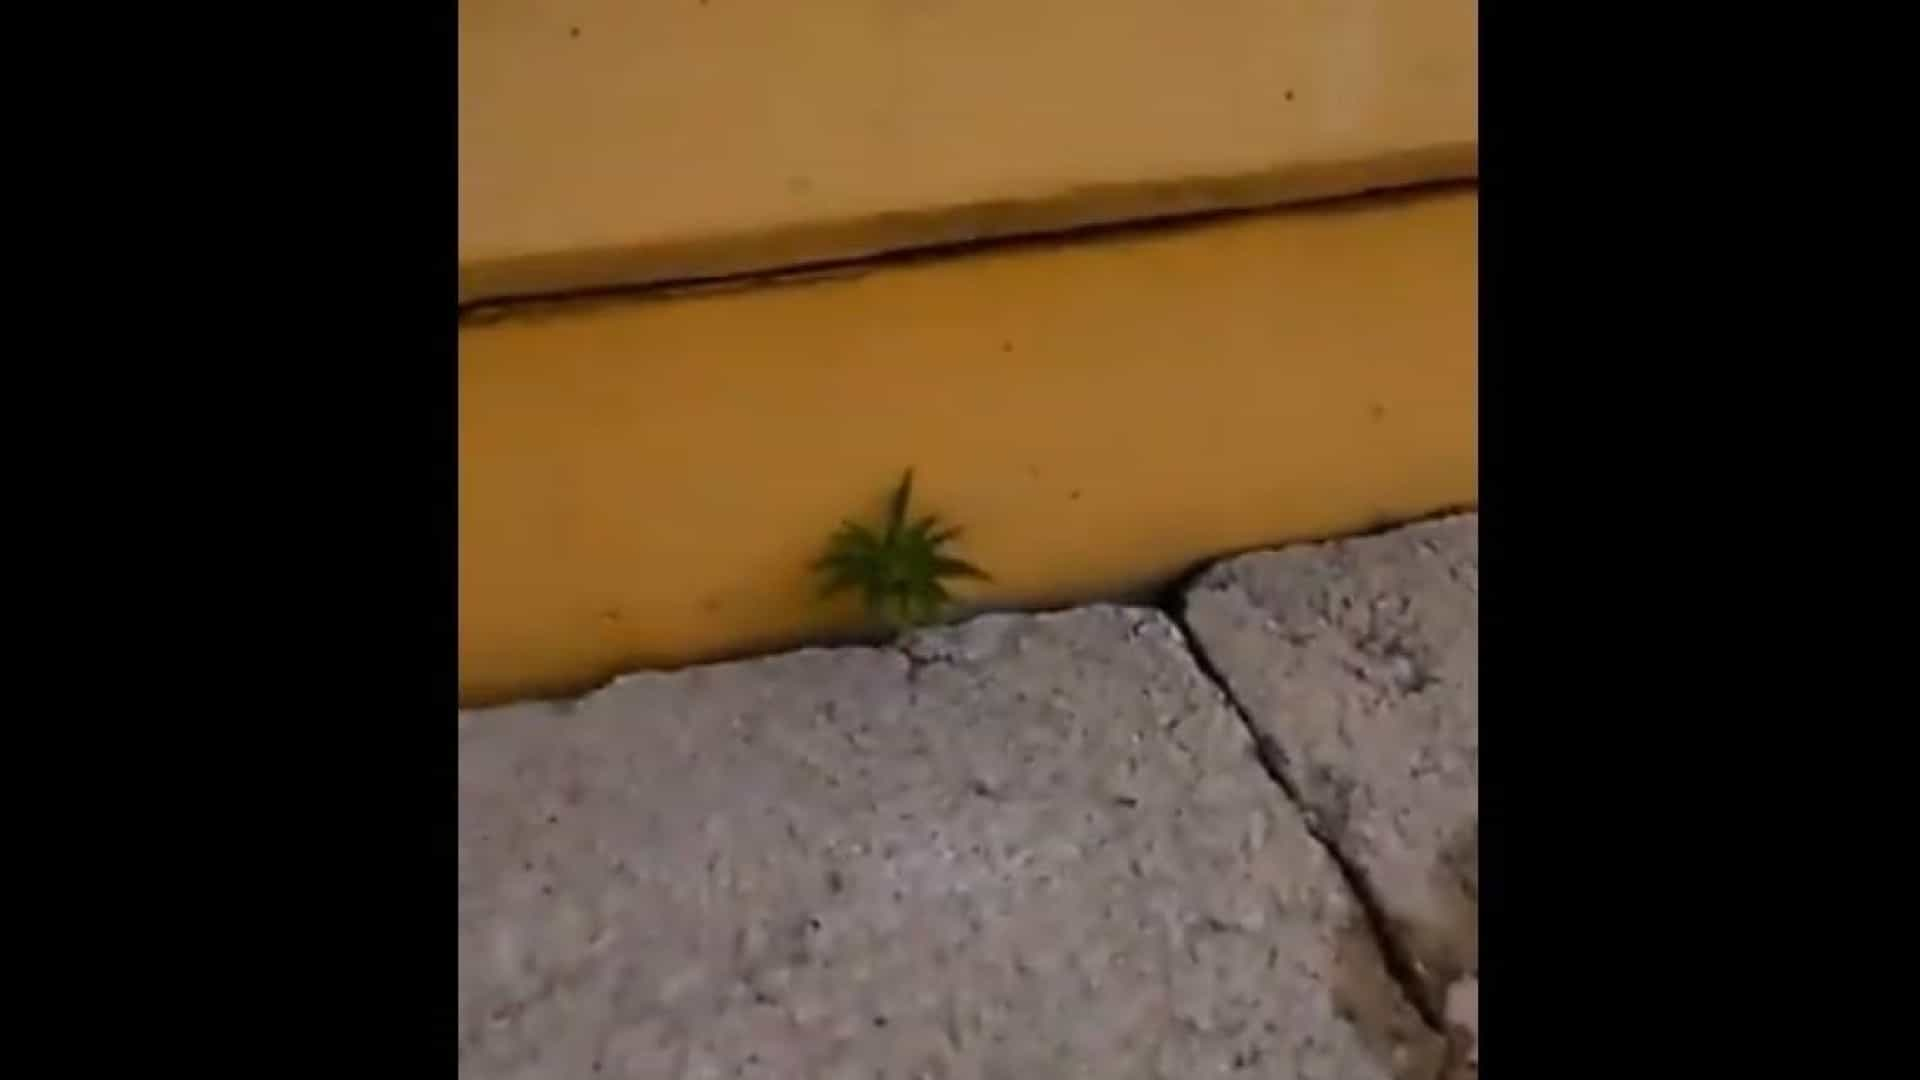 Marijuana nas bancadas do Peñarol. Este vídeo já se tornou viral